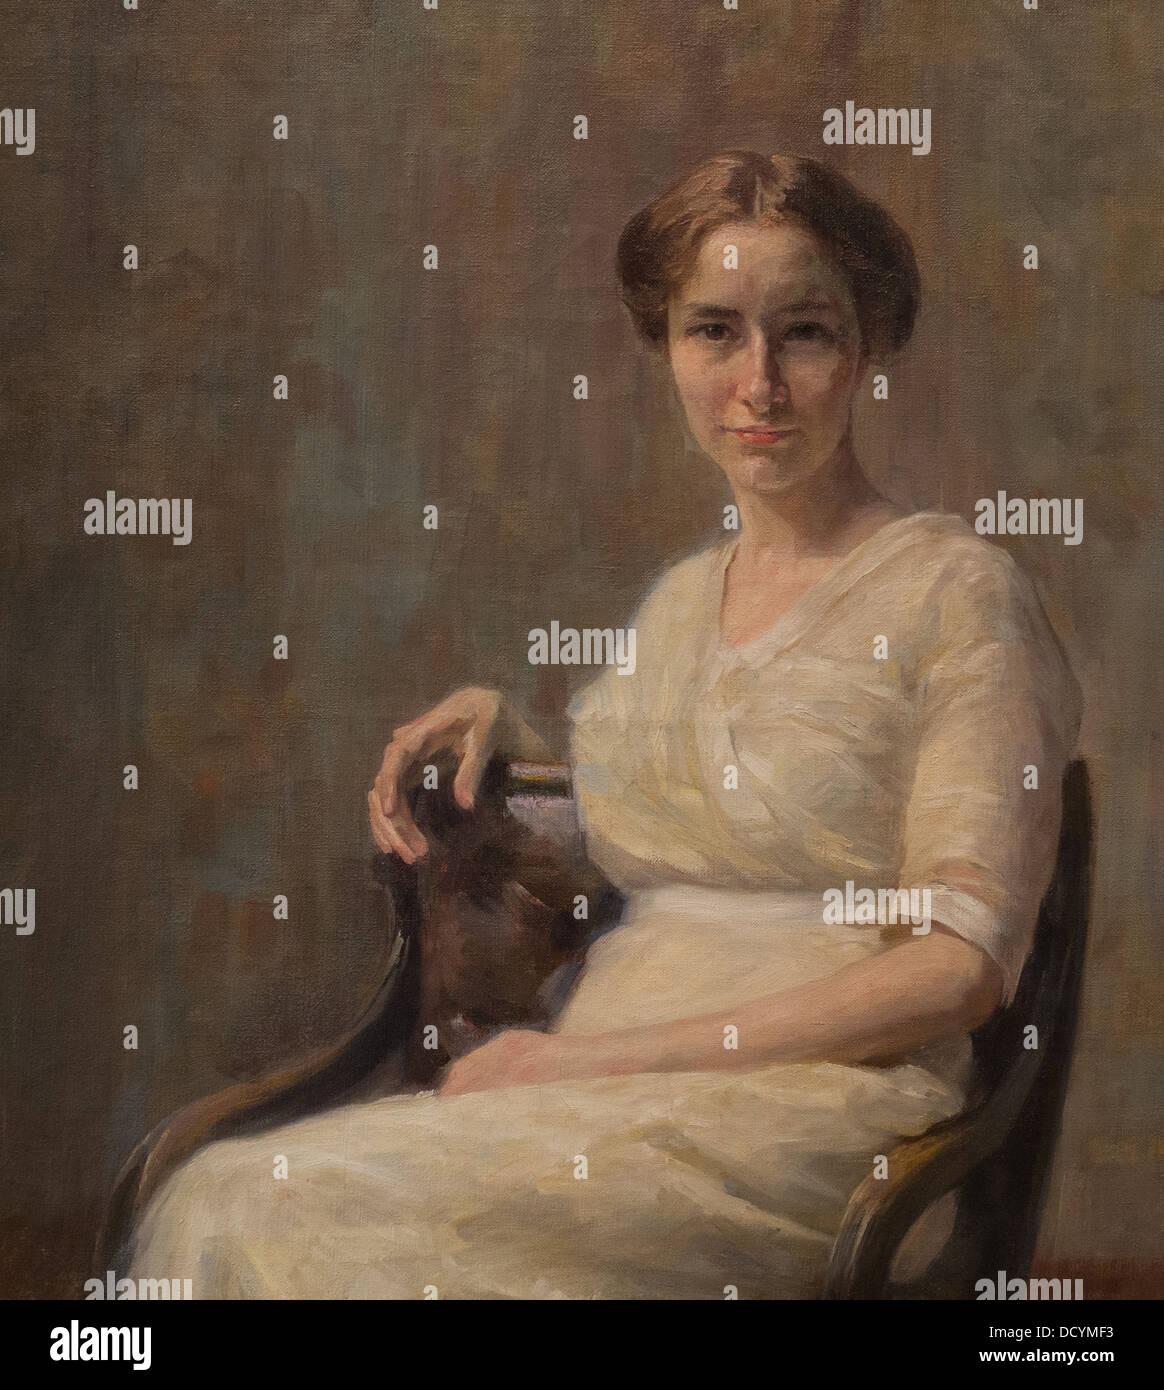 Siglo XX - Retrato de Mira - Pintar Ivana Kobilca (1913) óleo sobre lienzo Imagen De Stock